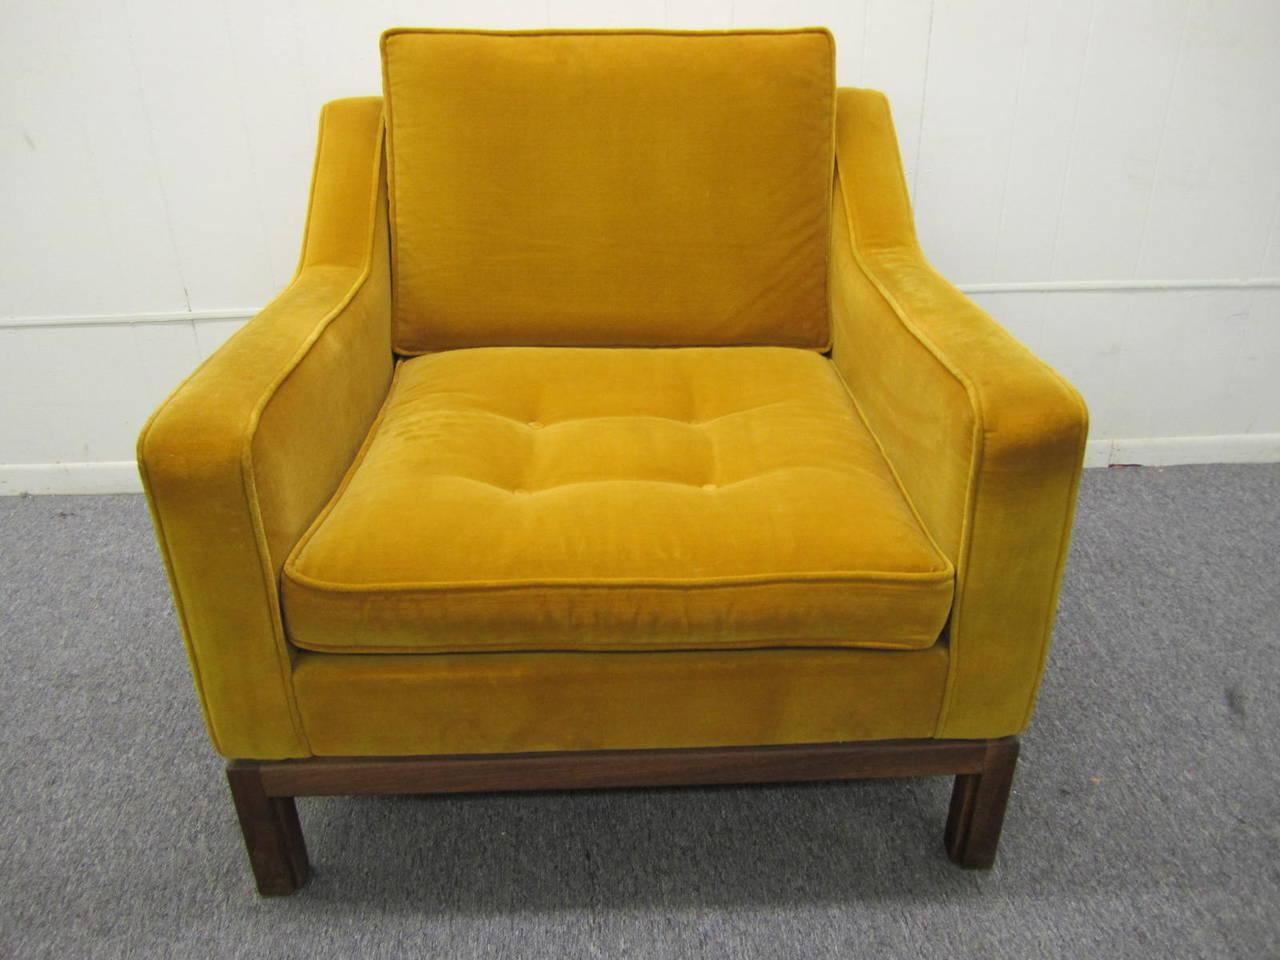 Jens Risom Chair, By Jens Risom Design Inc., USA, Walnut Frame With